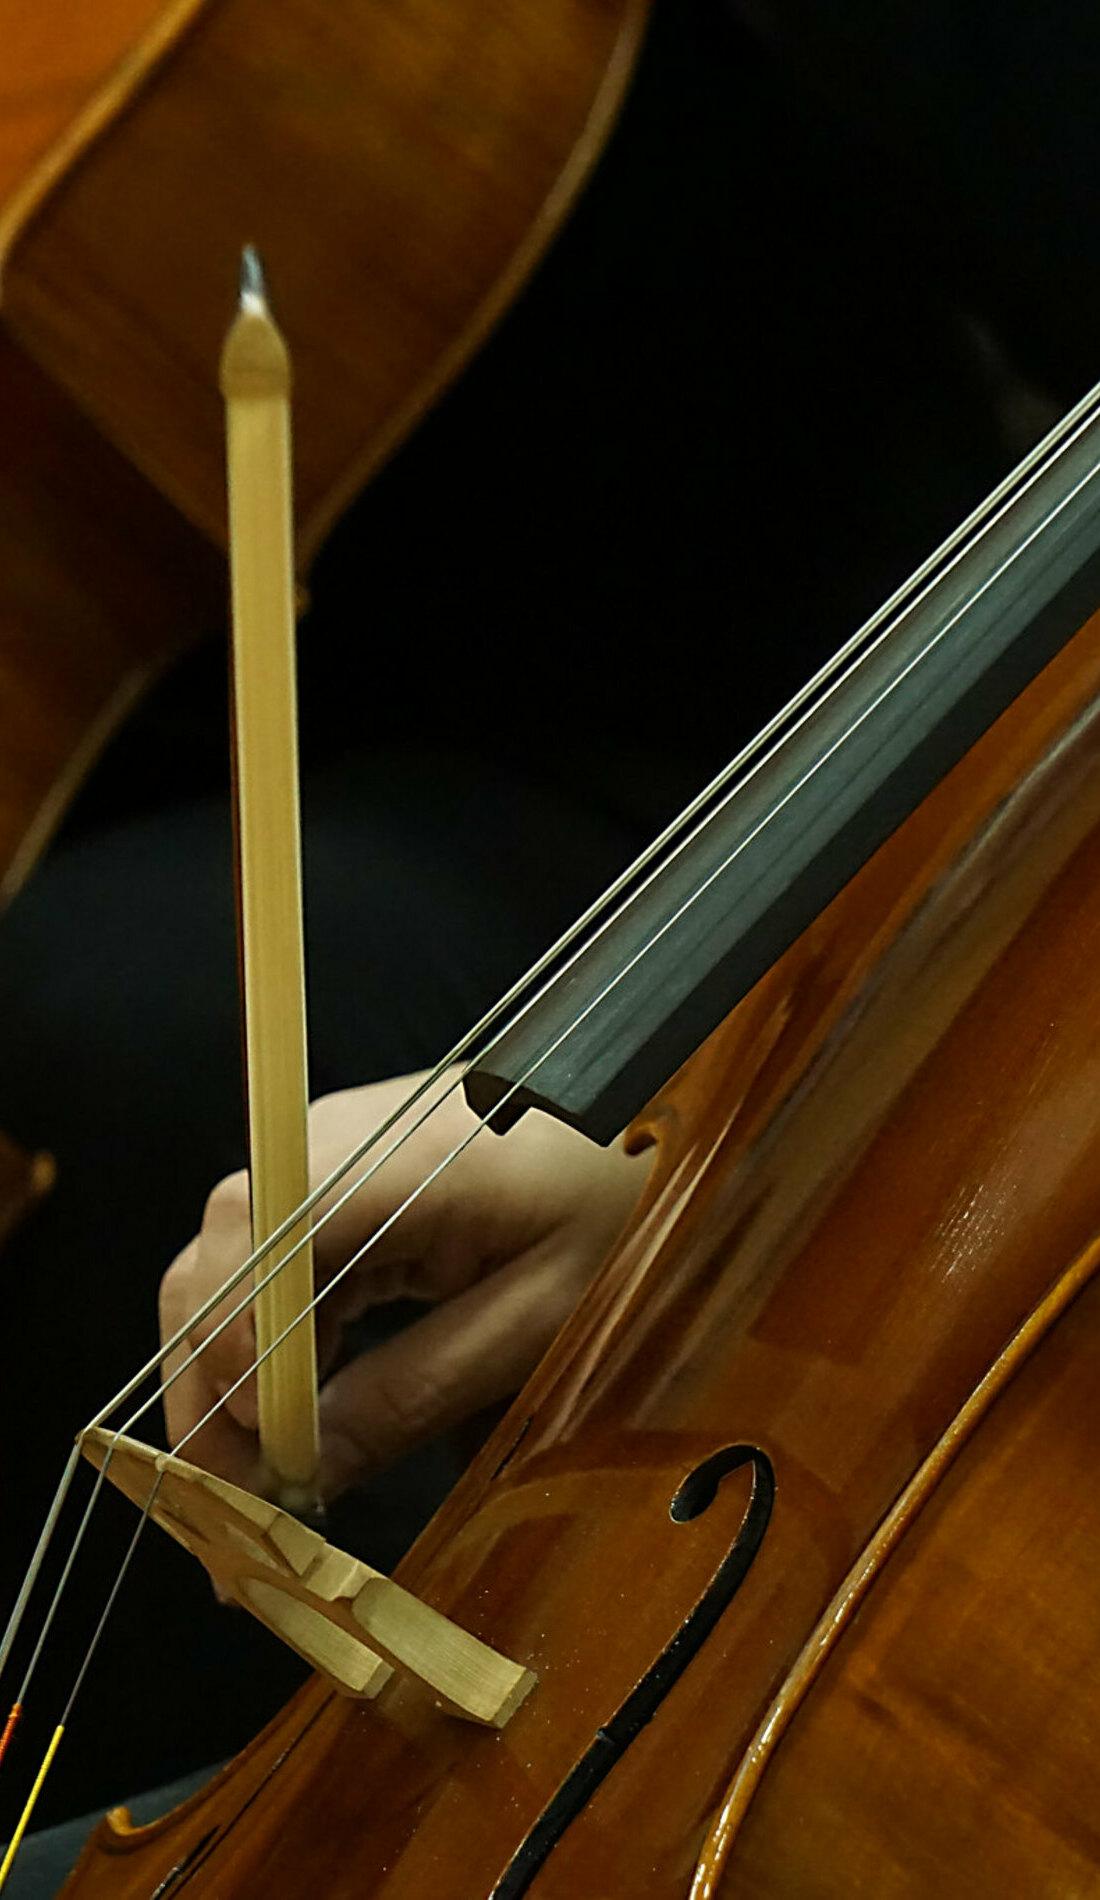 A Phoenix Symphony live event